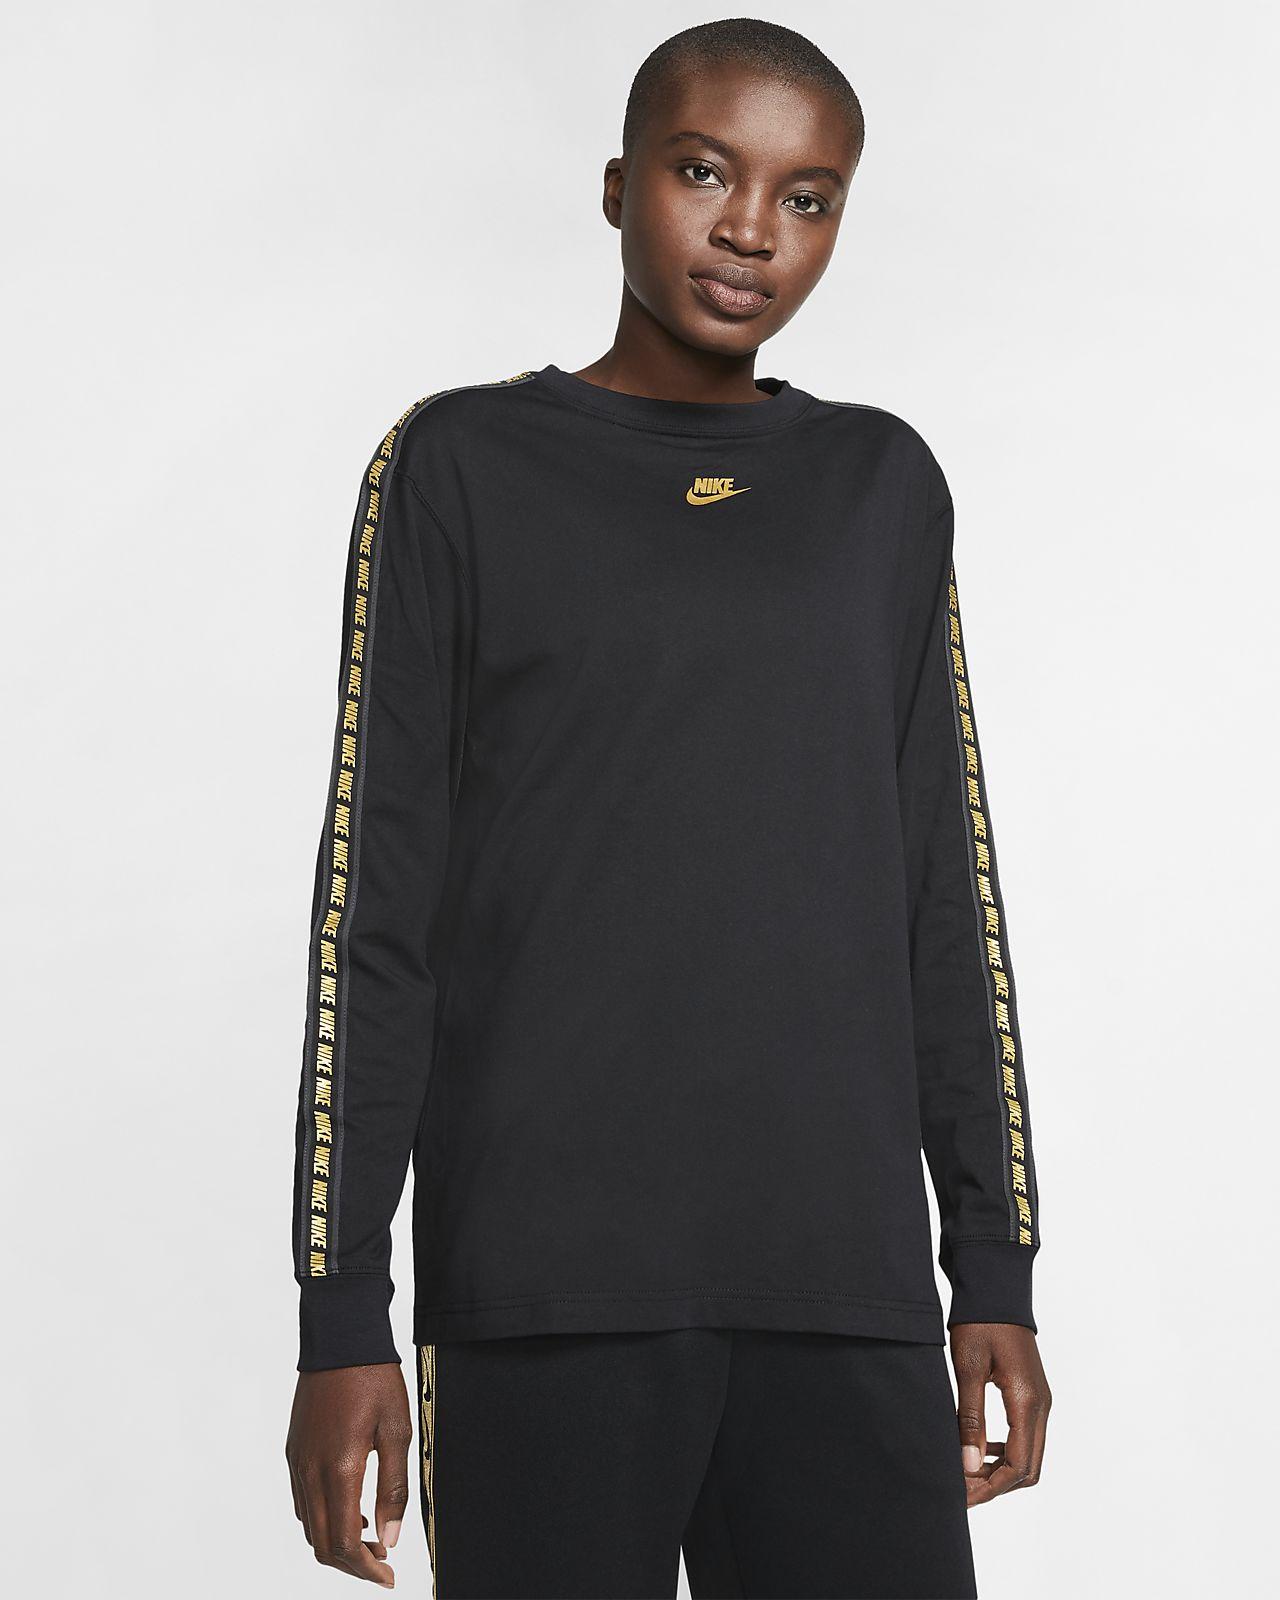 Женская футболка с длинным рукавом Nike Sportswear